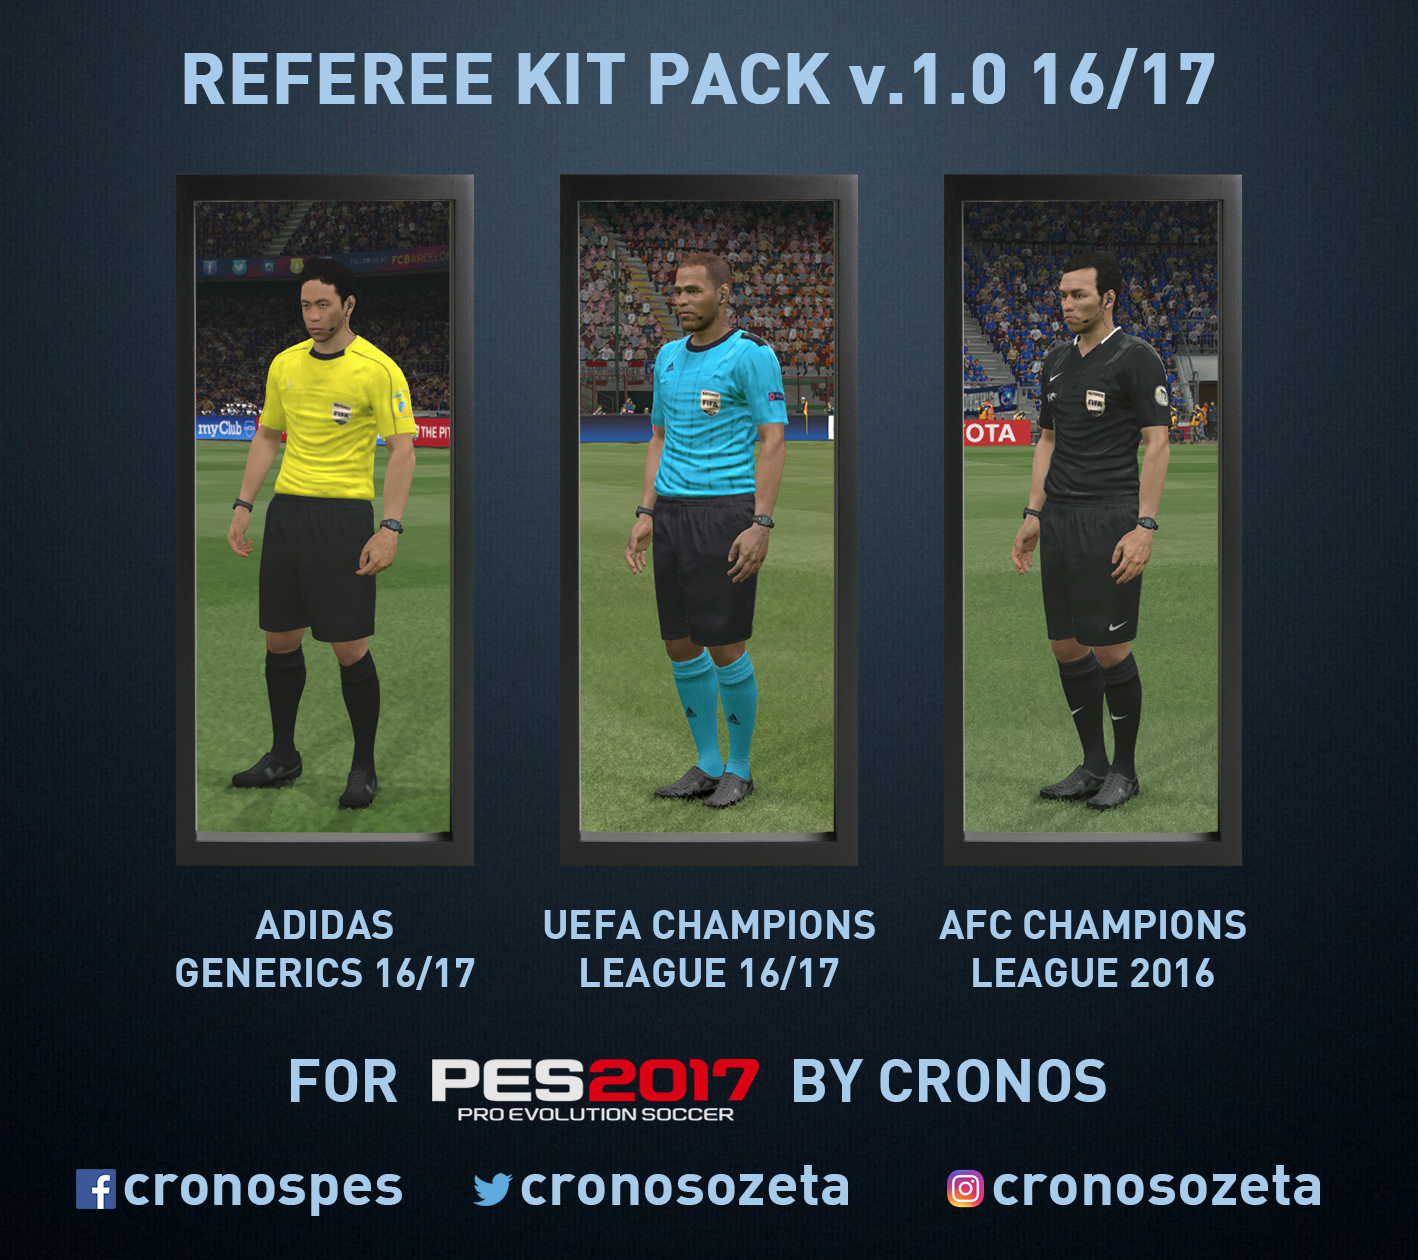 Kit pack de árbitros 16/17 v1.0 by Cronos